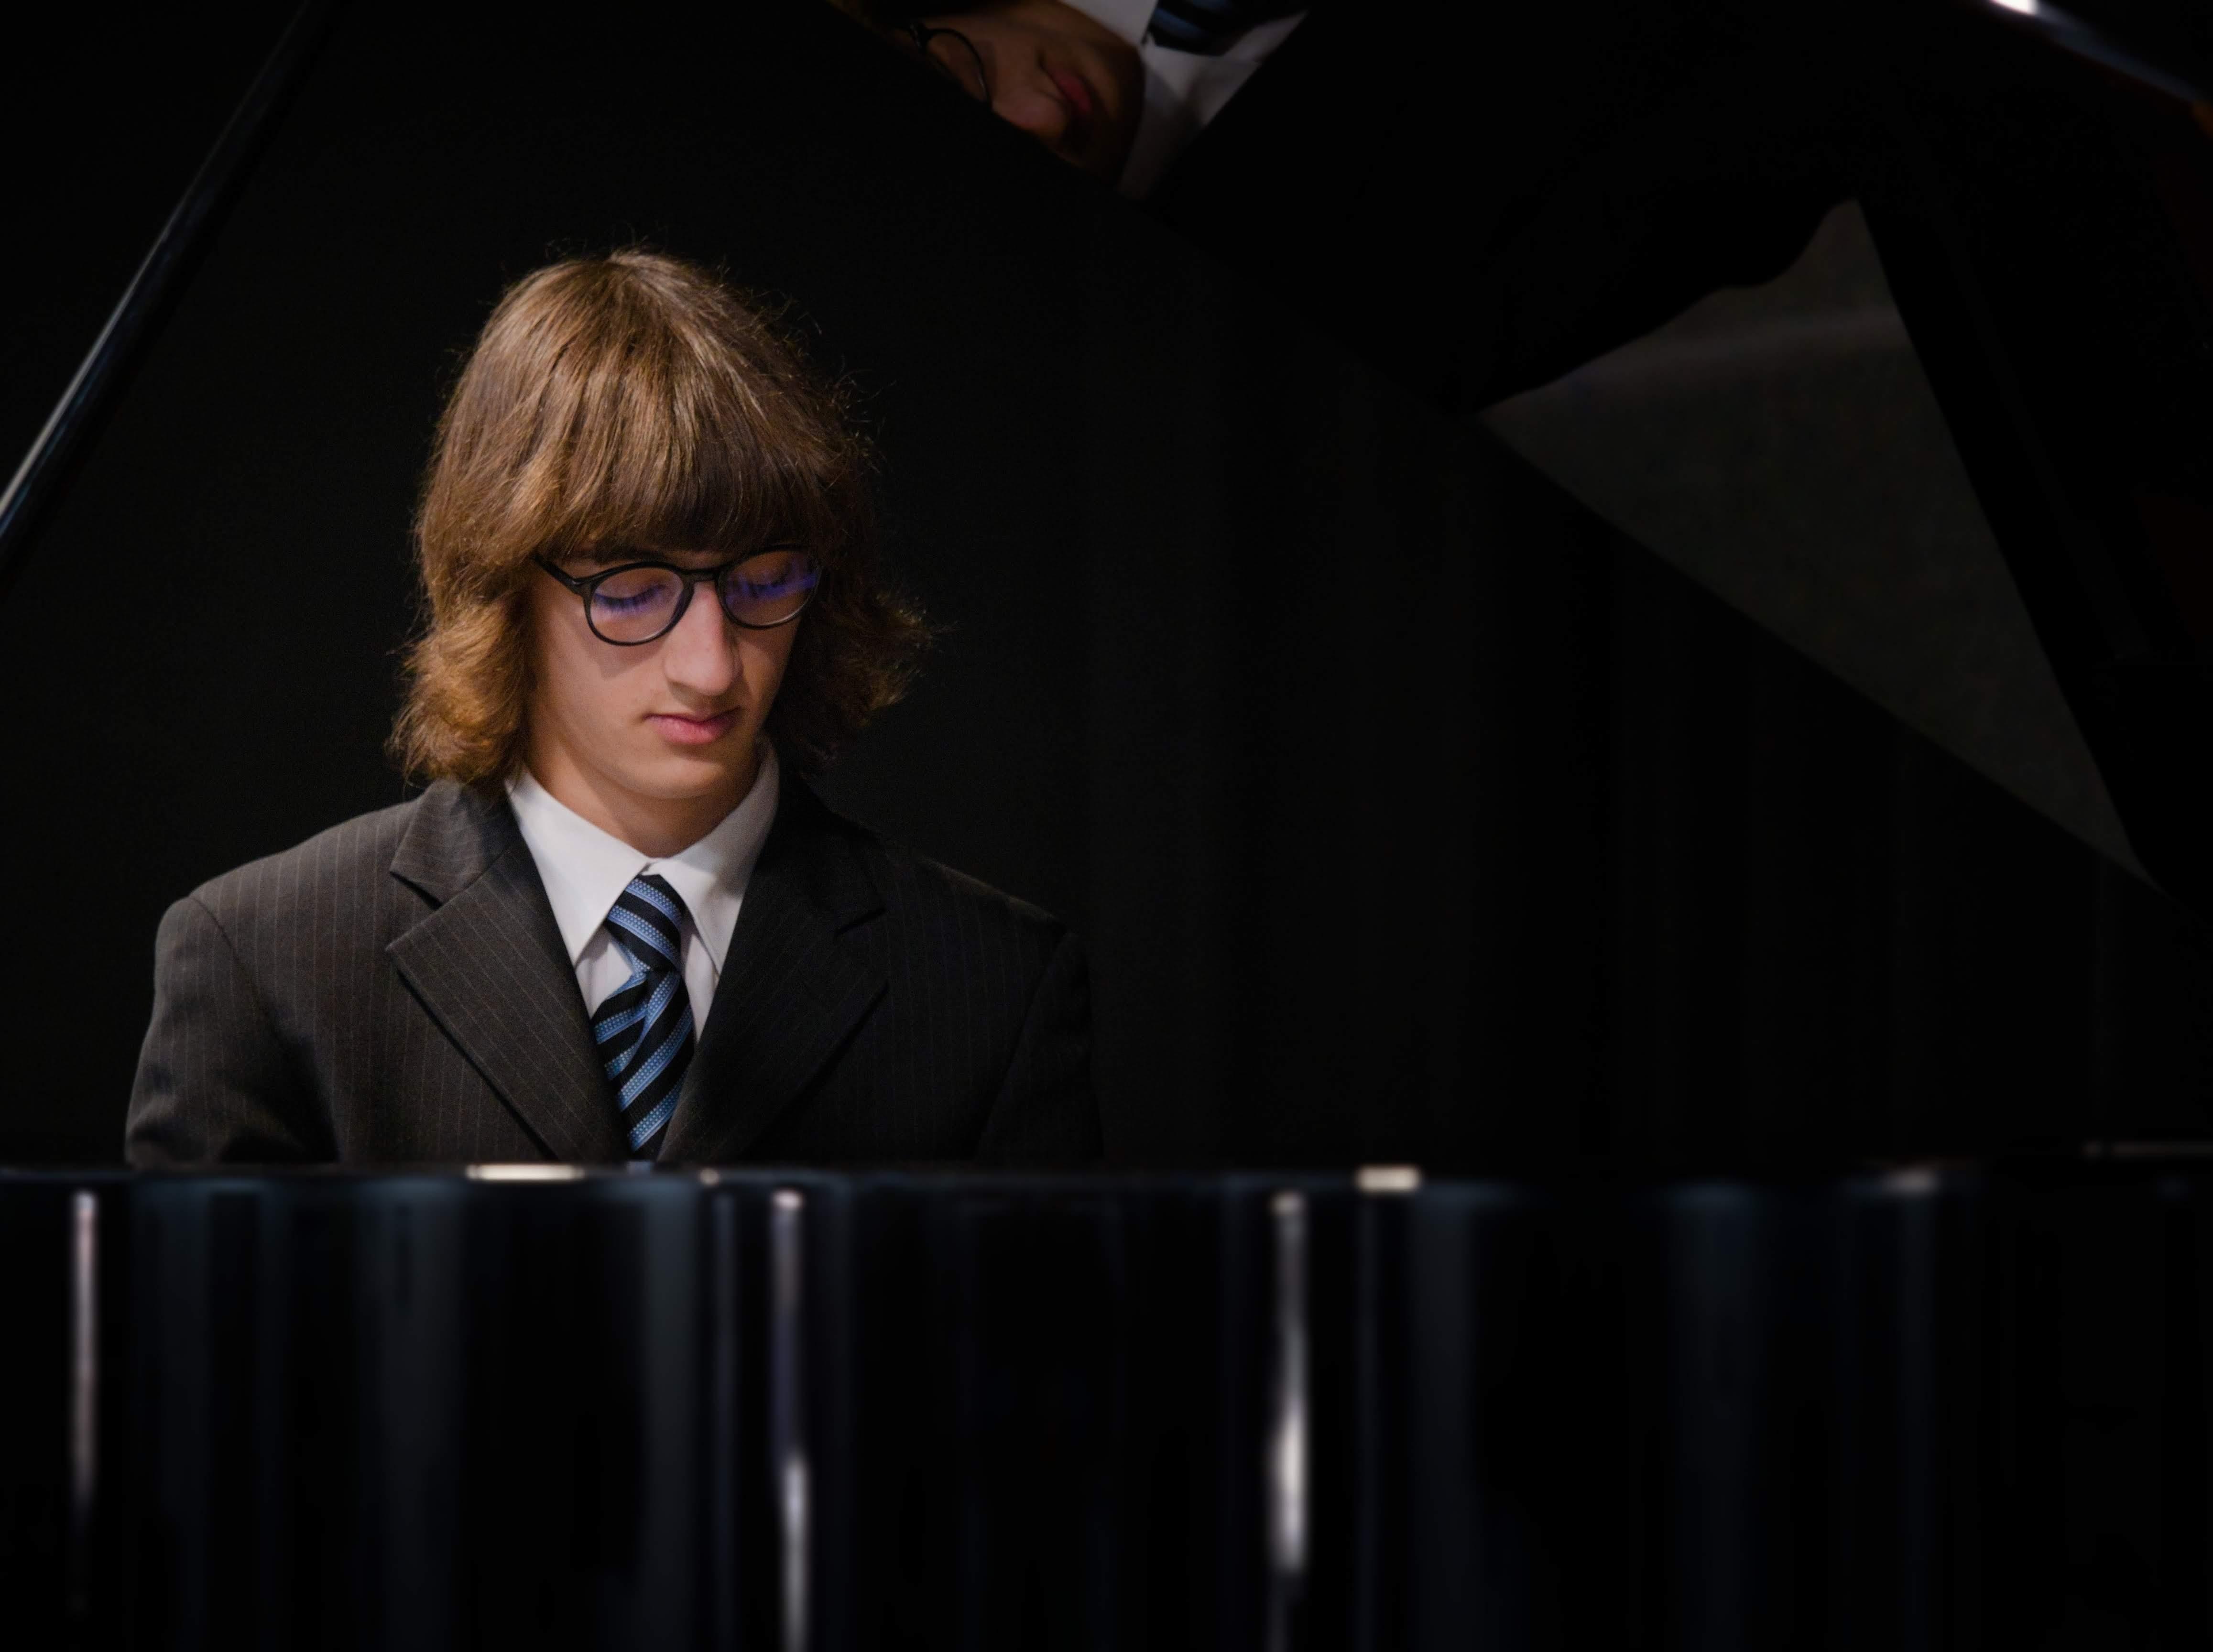 WGE Pianoforte Day 4 Ali Shlaibeq Displays His Skills on the Piano